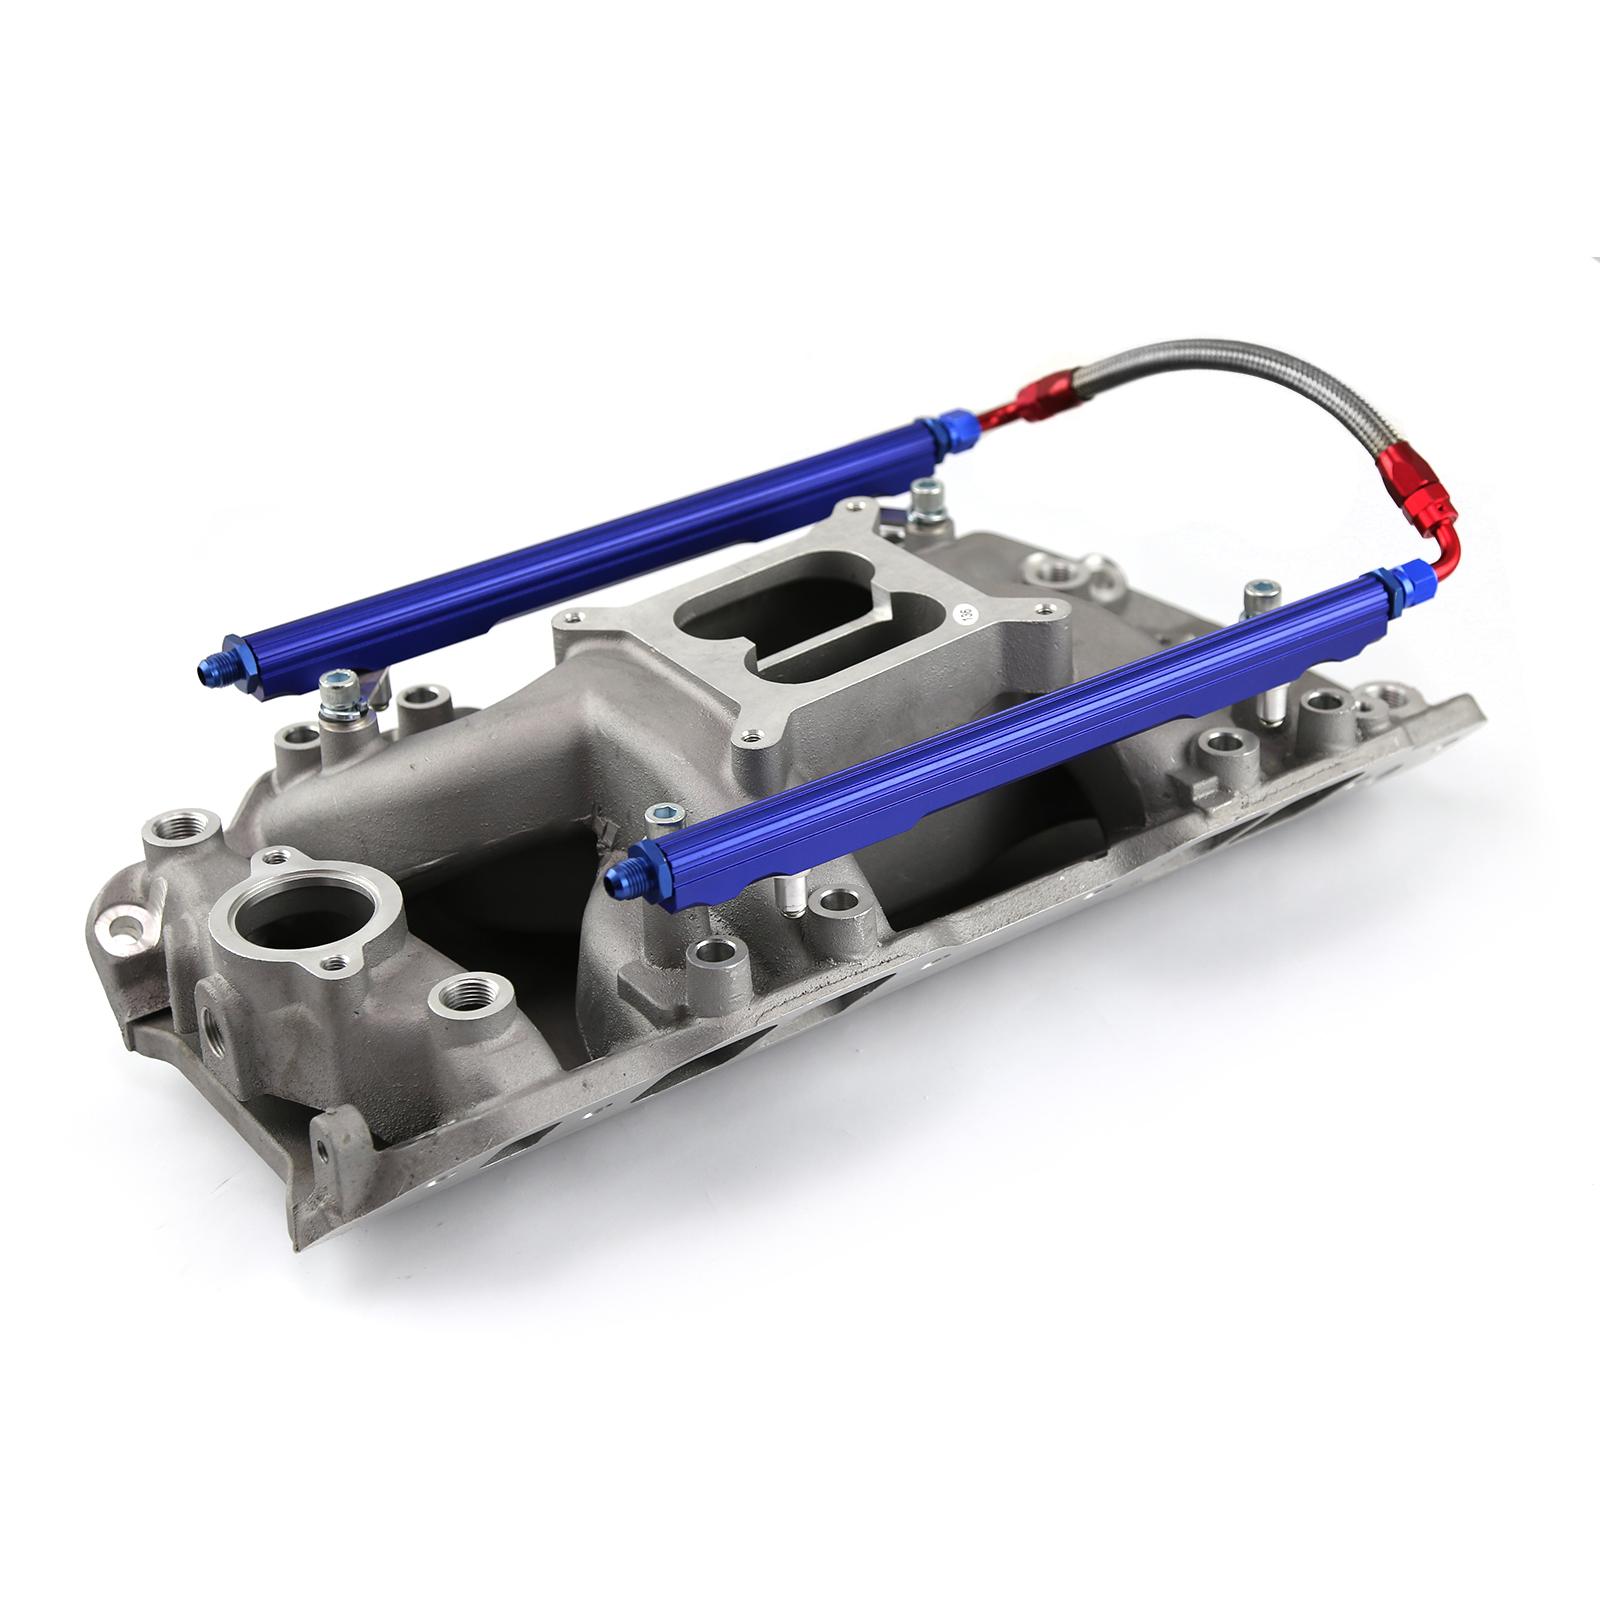 Chevy BBC 454 Rect Port Eliminator w/Inj Ports & Fuel Rails Intake Manifold